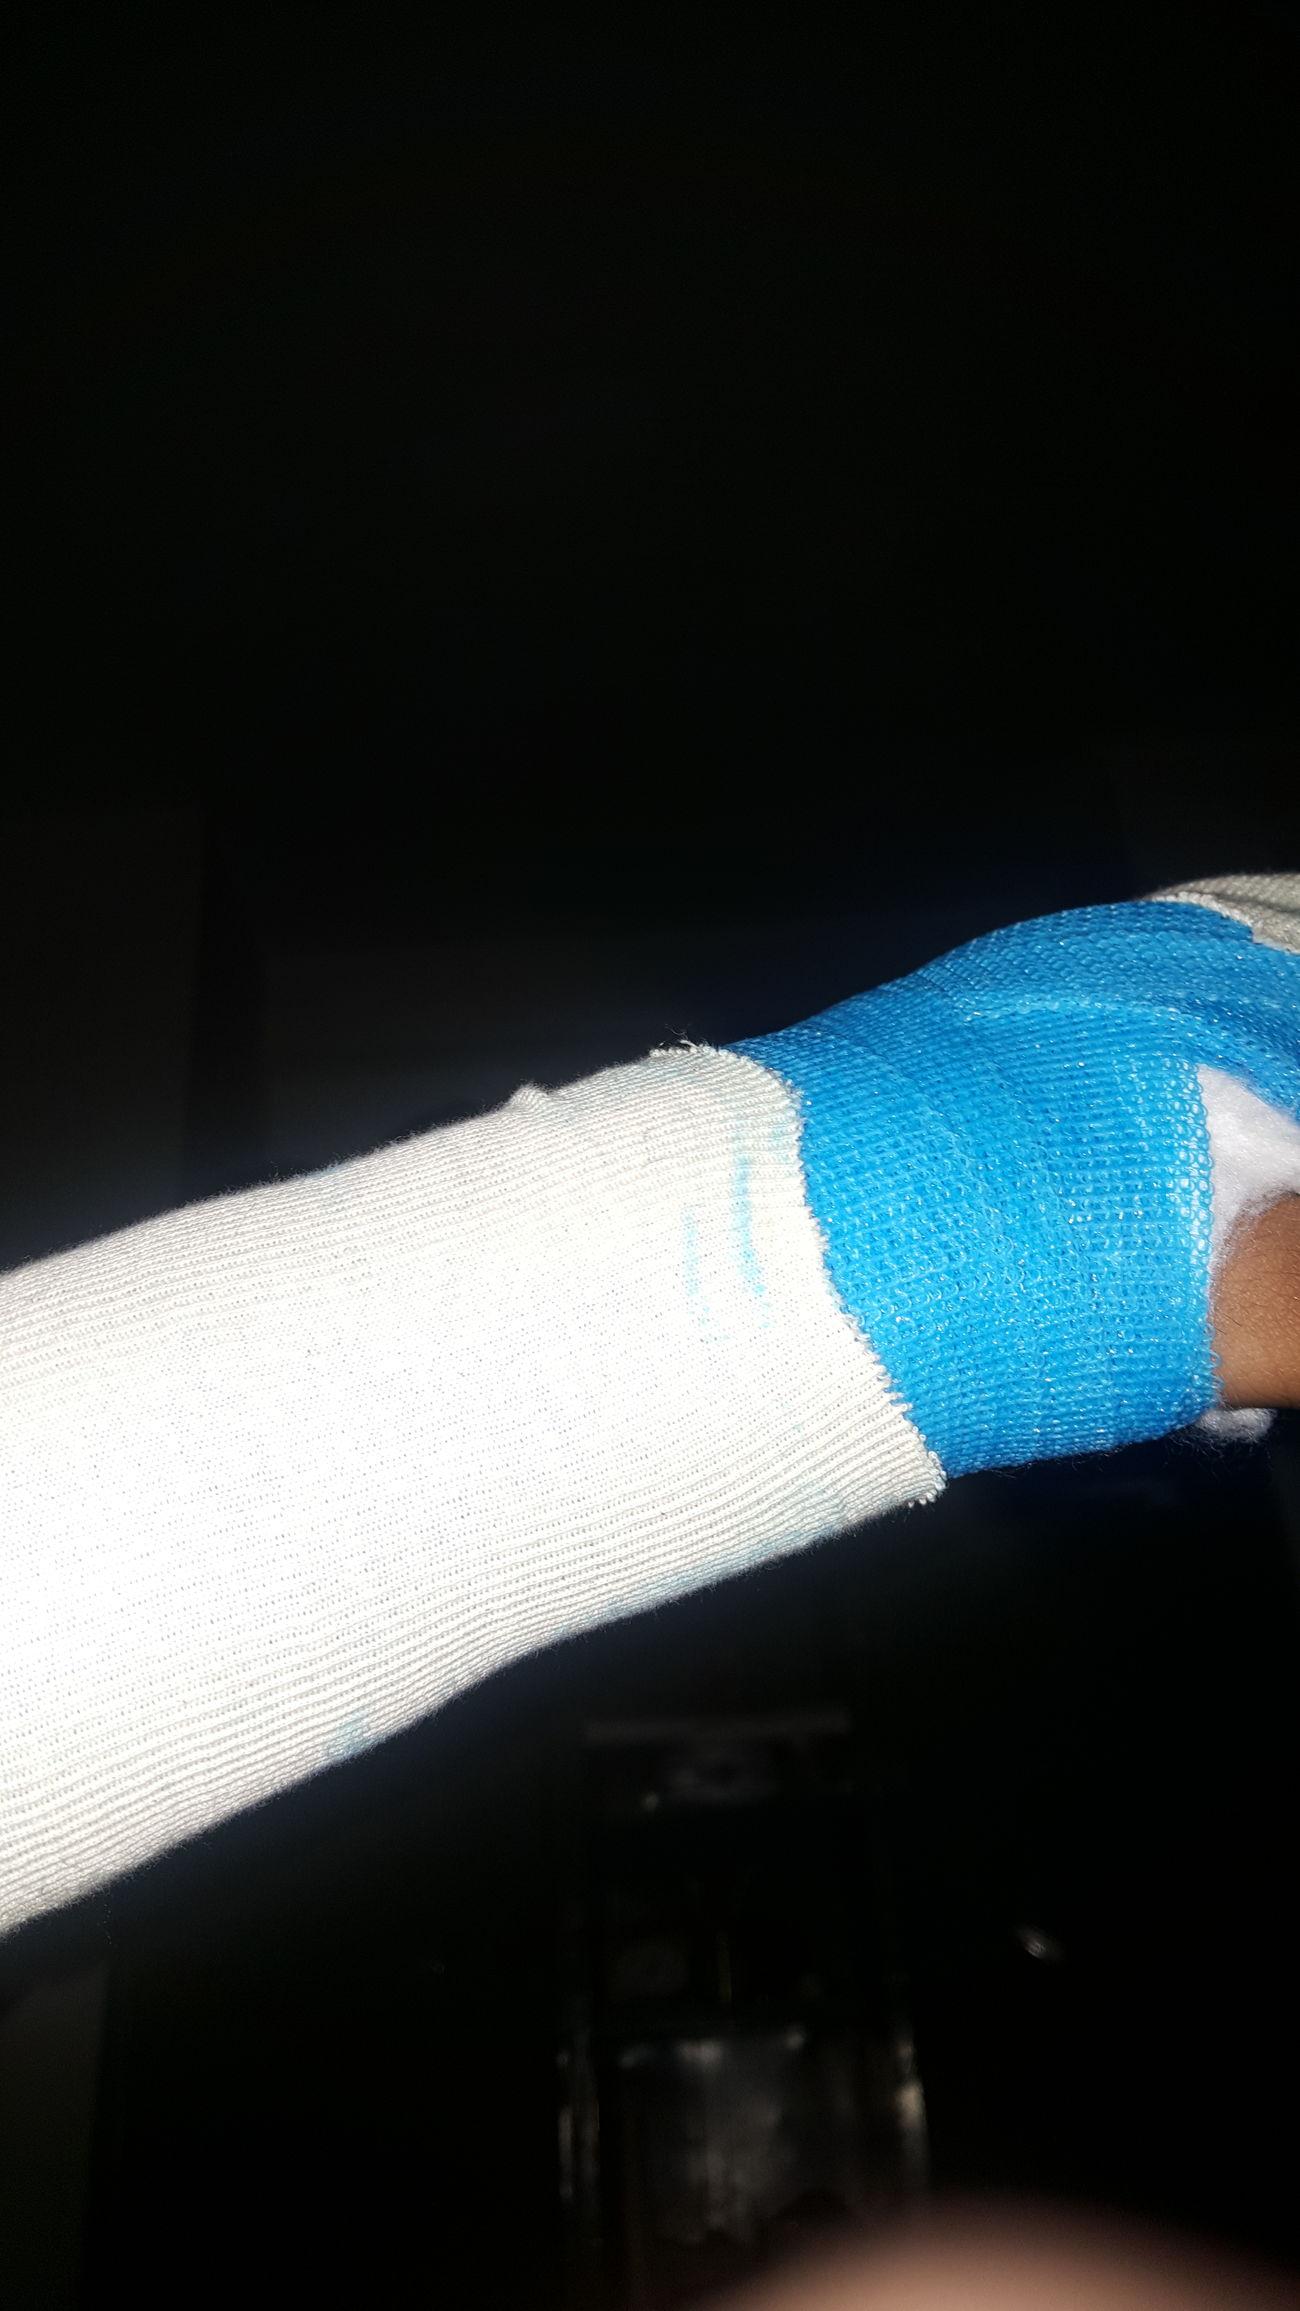 Got injured 😣😣 Shadow Close-up Indoors  No People Day Plaster Broken Bone wrist First Eyeem Photo